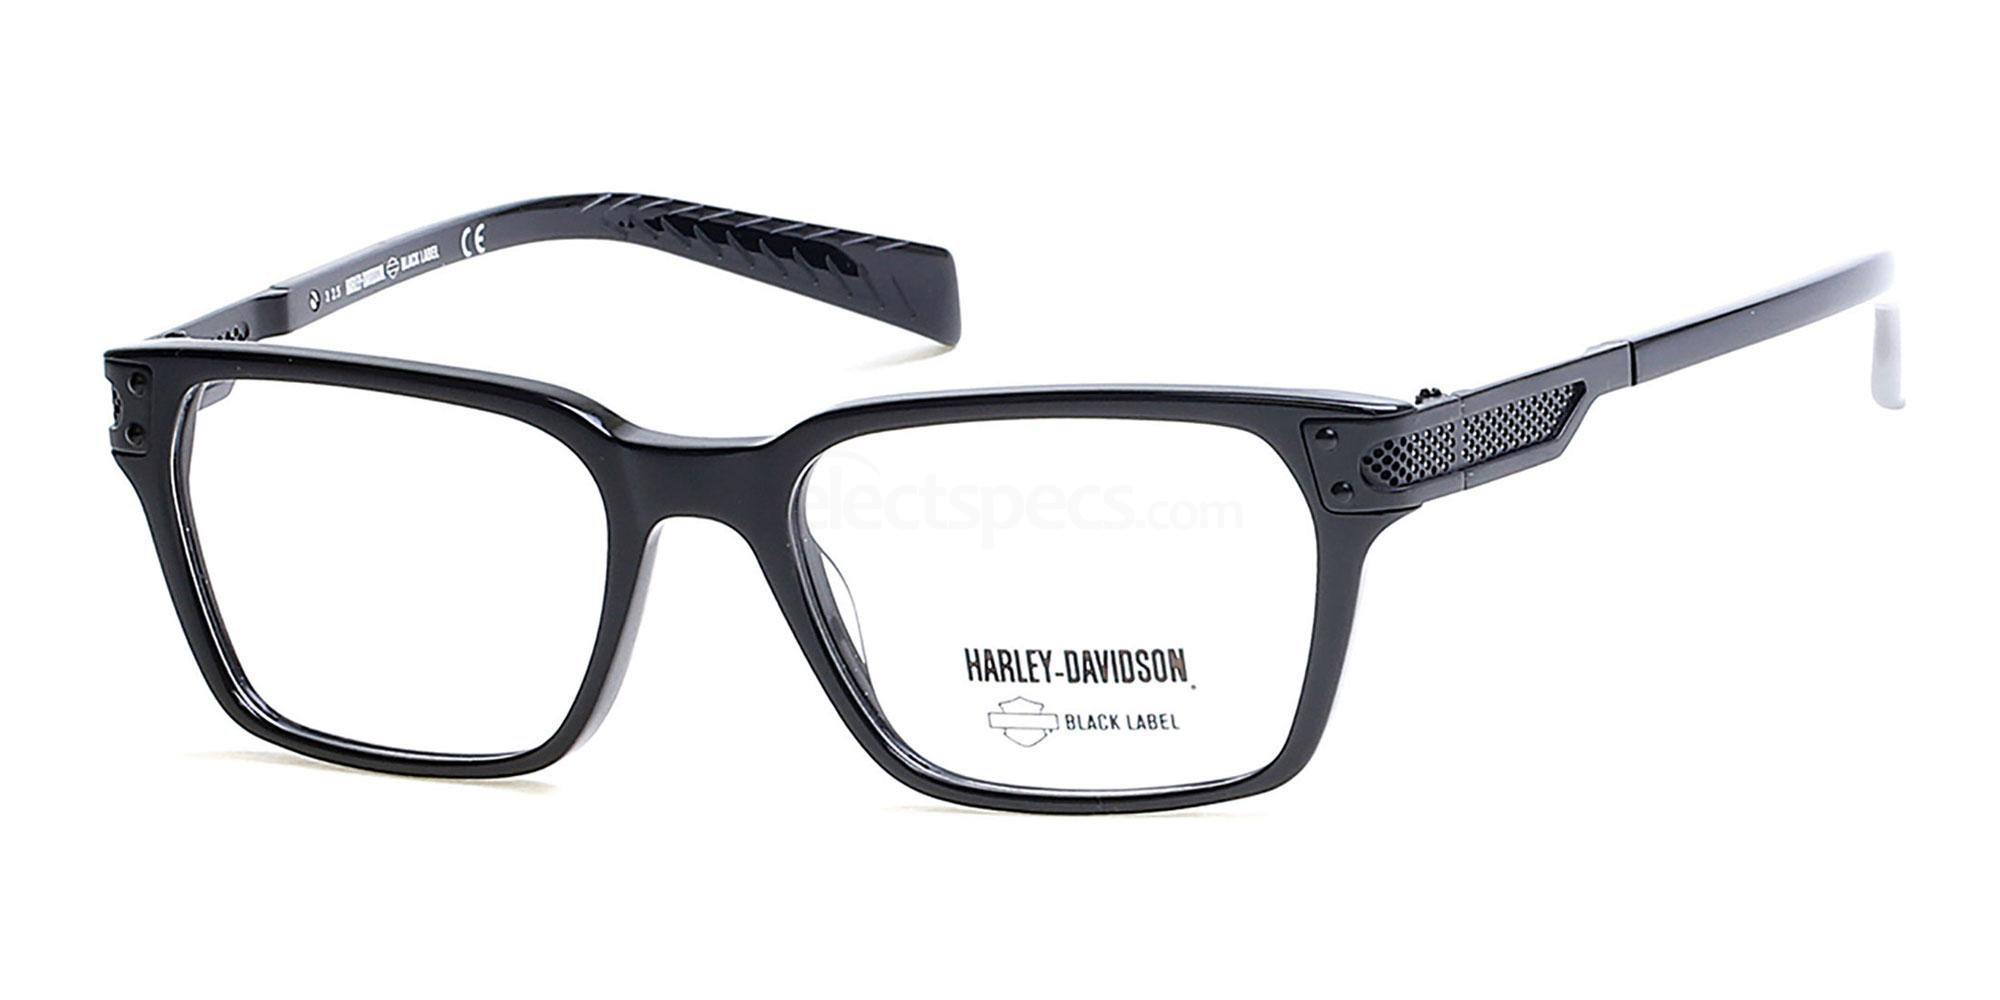 001 HD 1029 Glasses, Harley Davidson